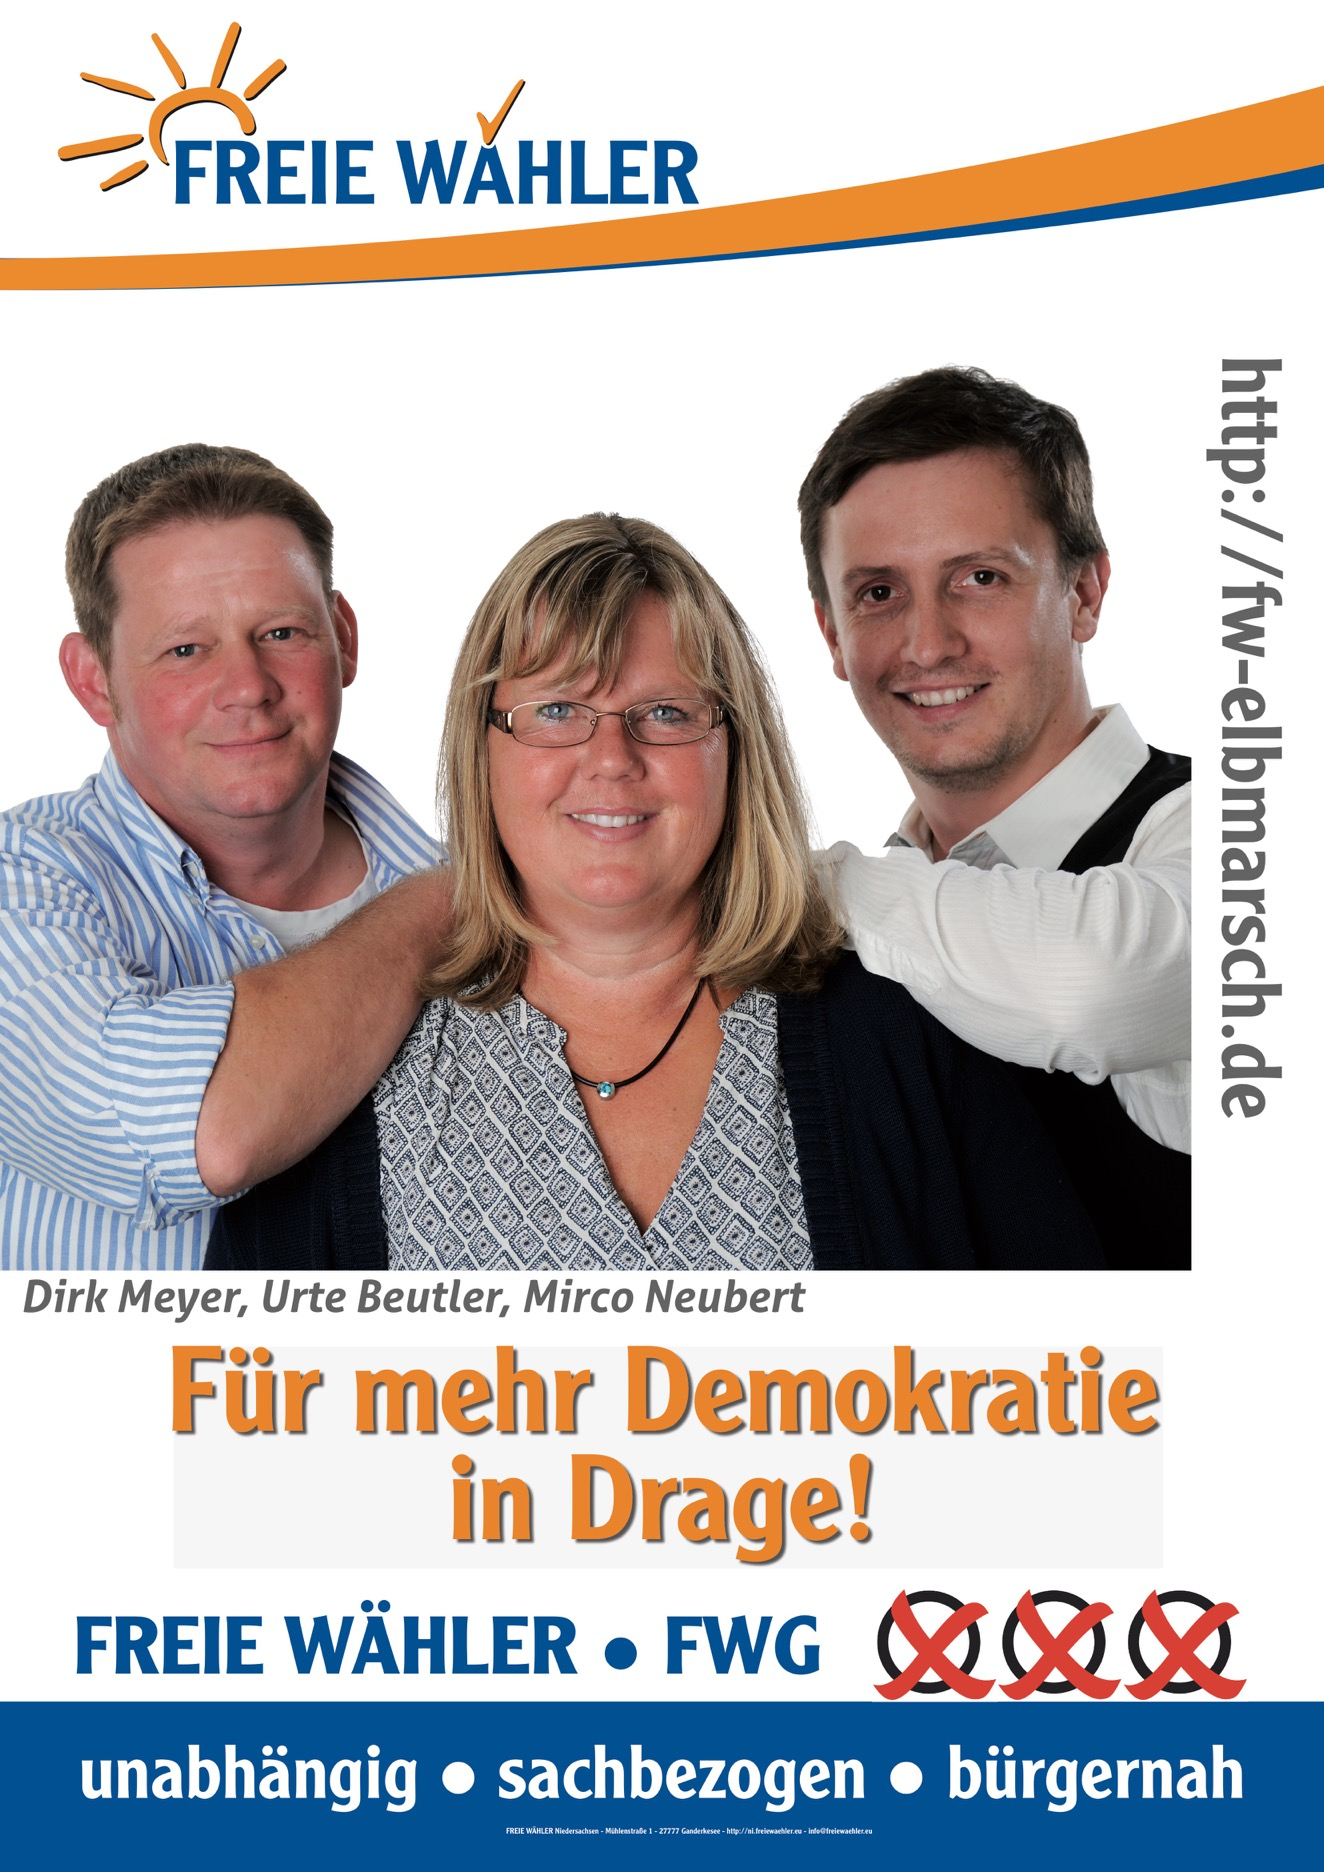 Dirk Meyer, Urte Beutler, Mirco Neubert